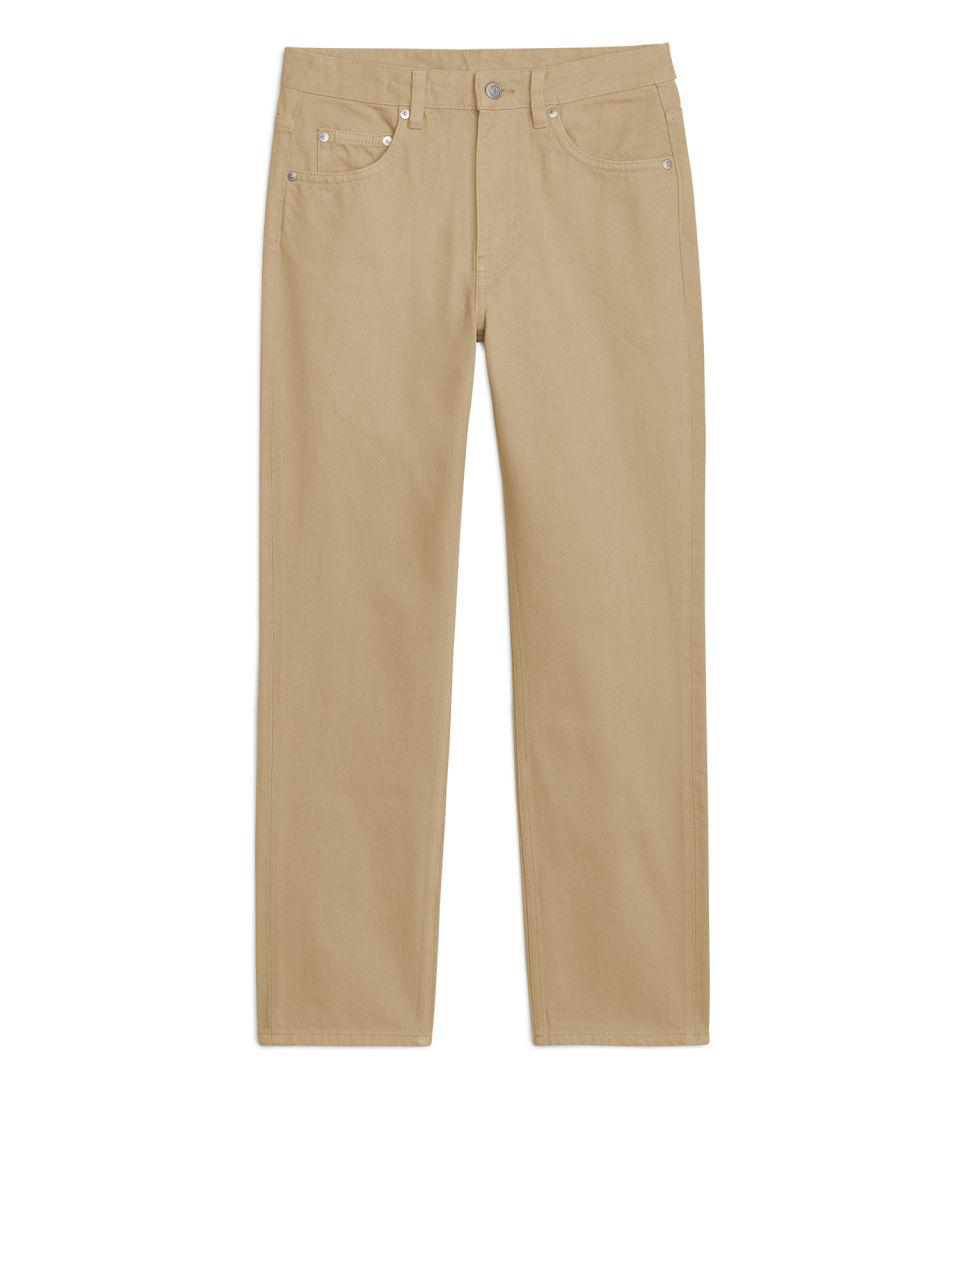 REGULAR Overdyed Jeans - Beige